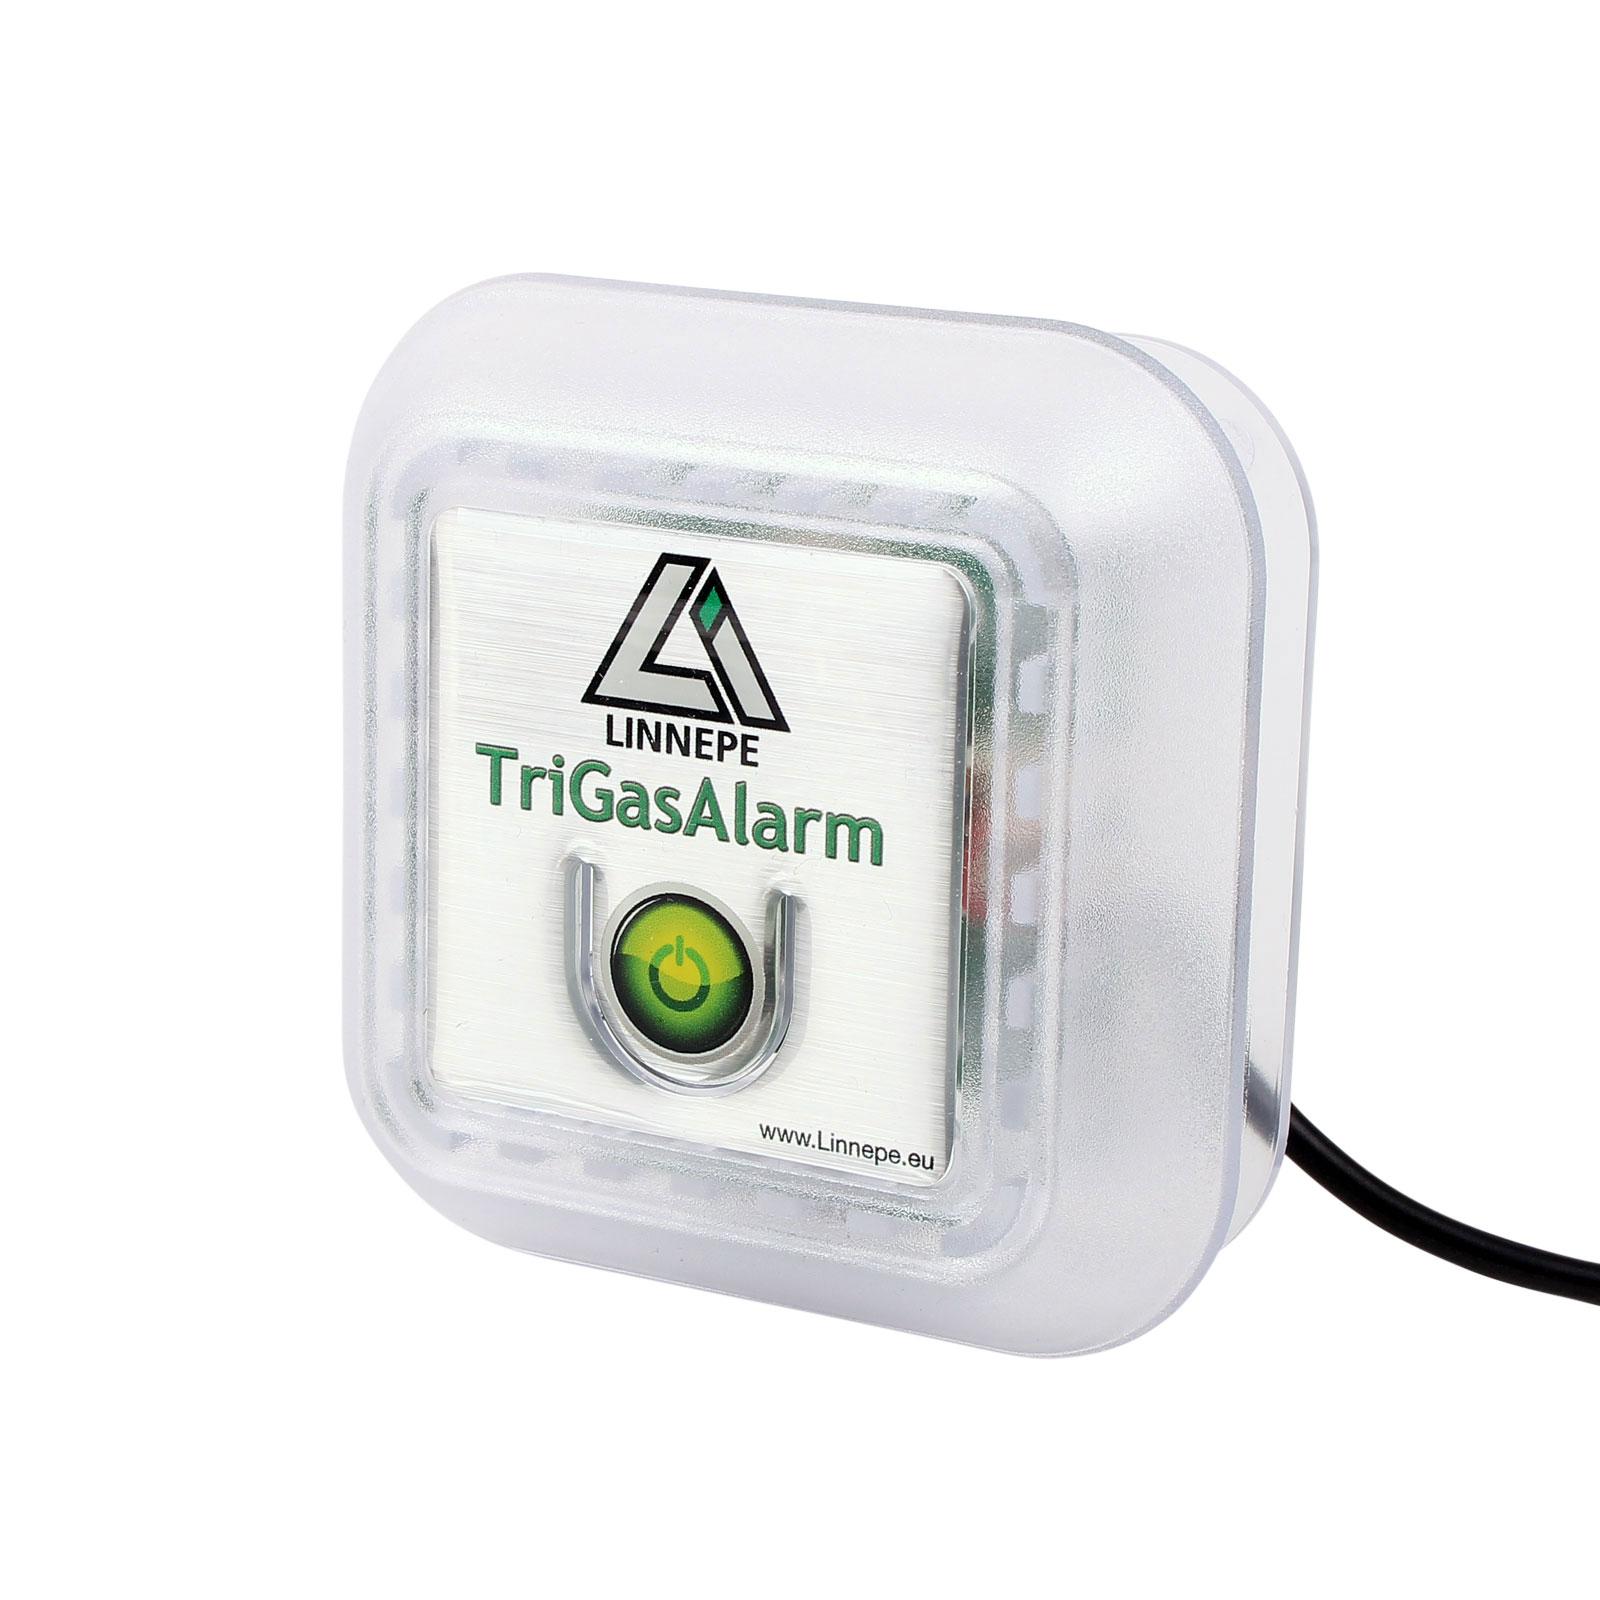 Linnepe Multigasmelder für Propan/Butan, KO Gase